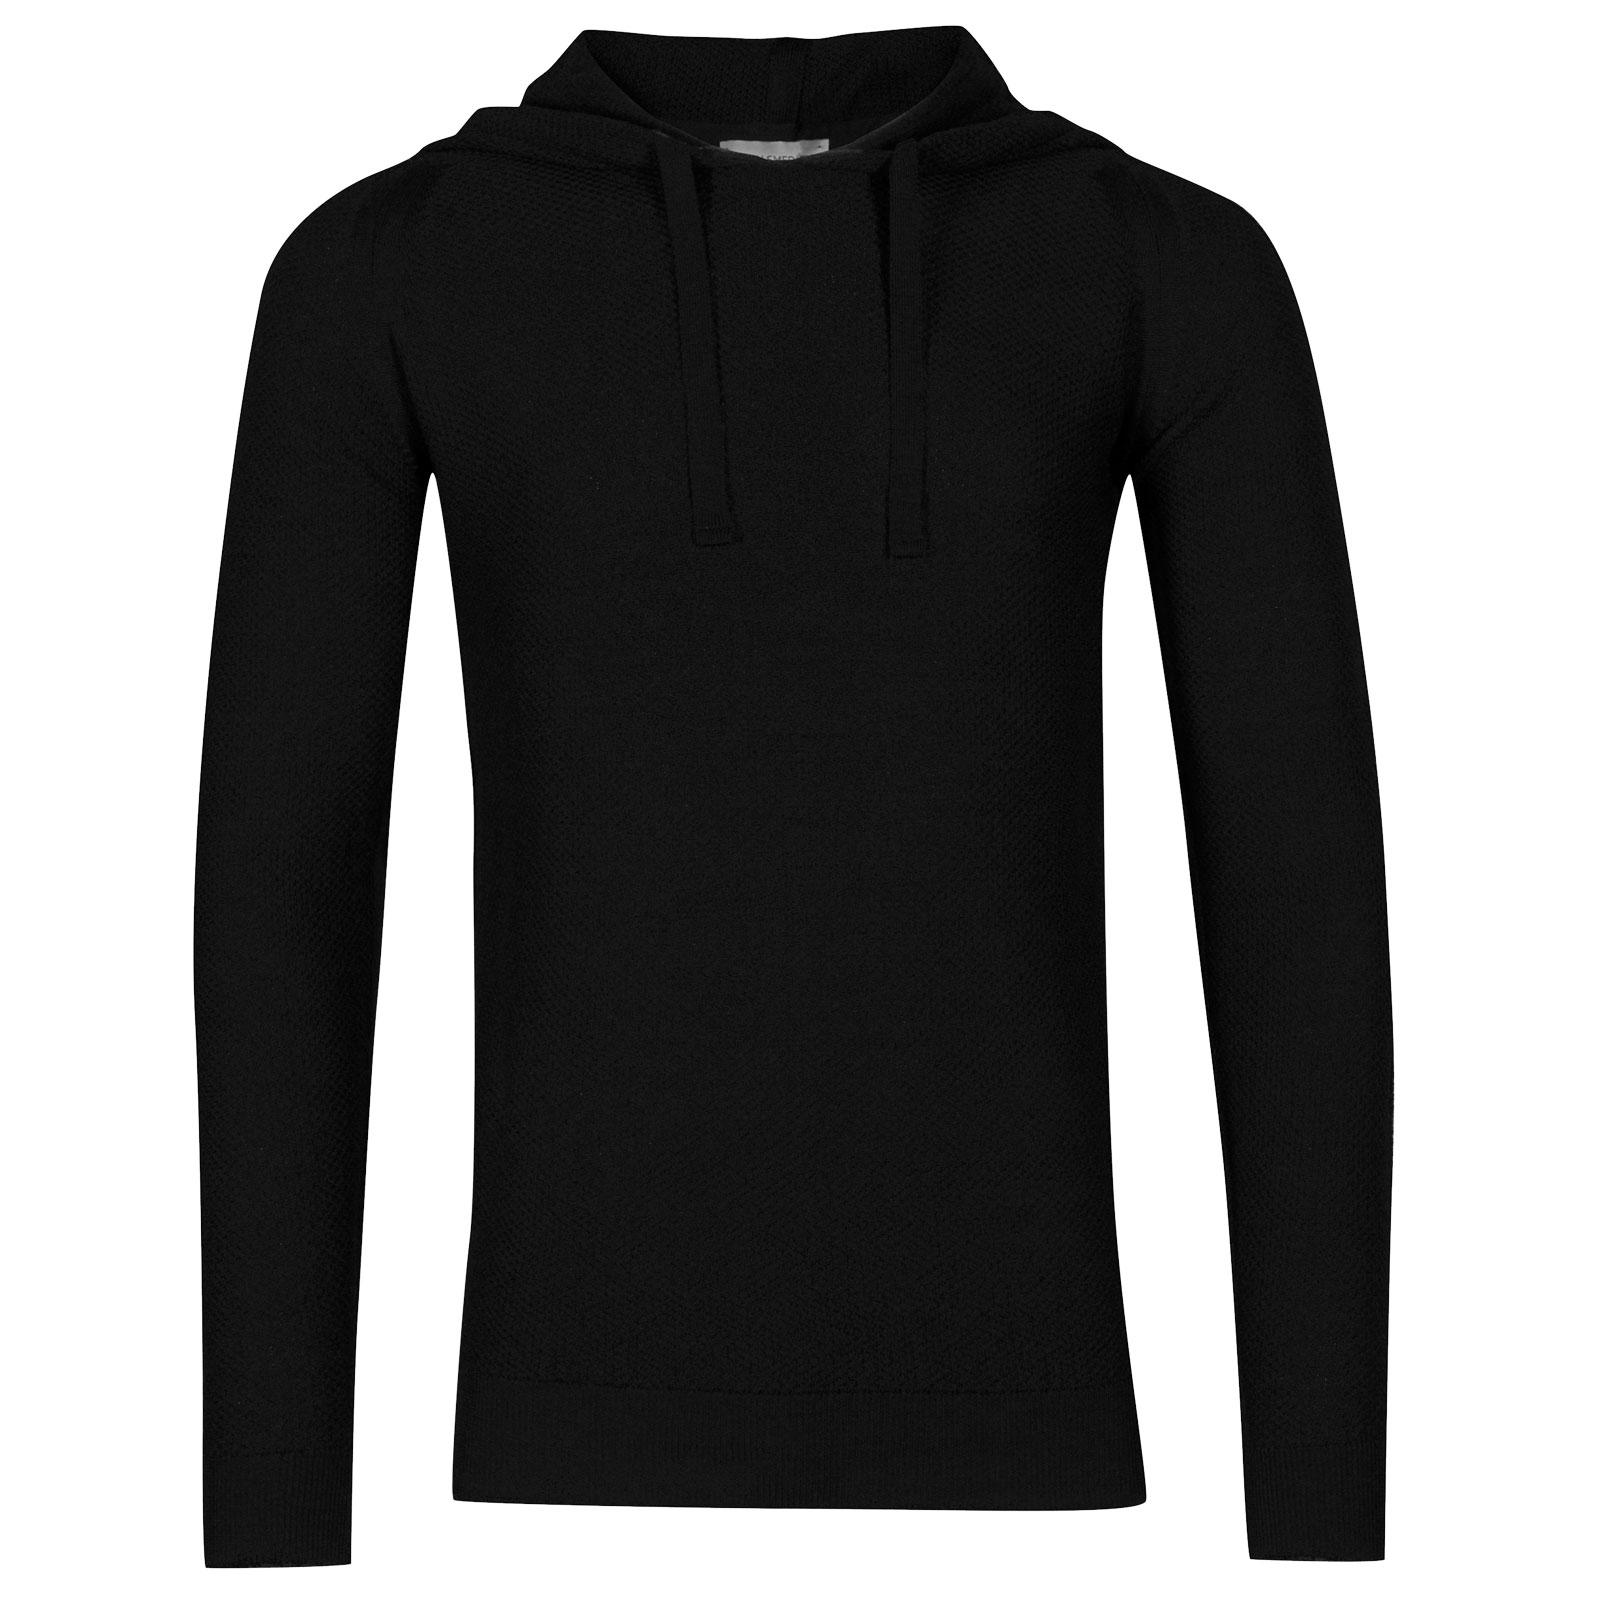 John Smedley 4singular Merino Wool Pullover in Black-XXL